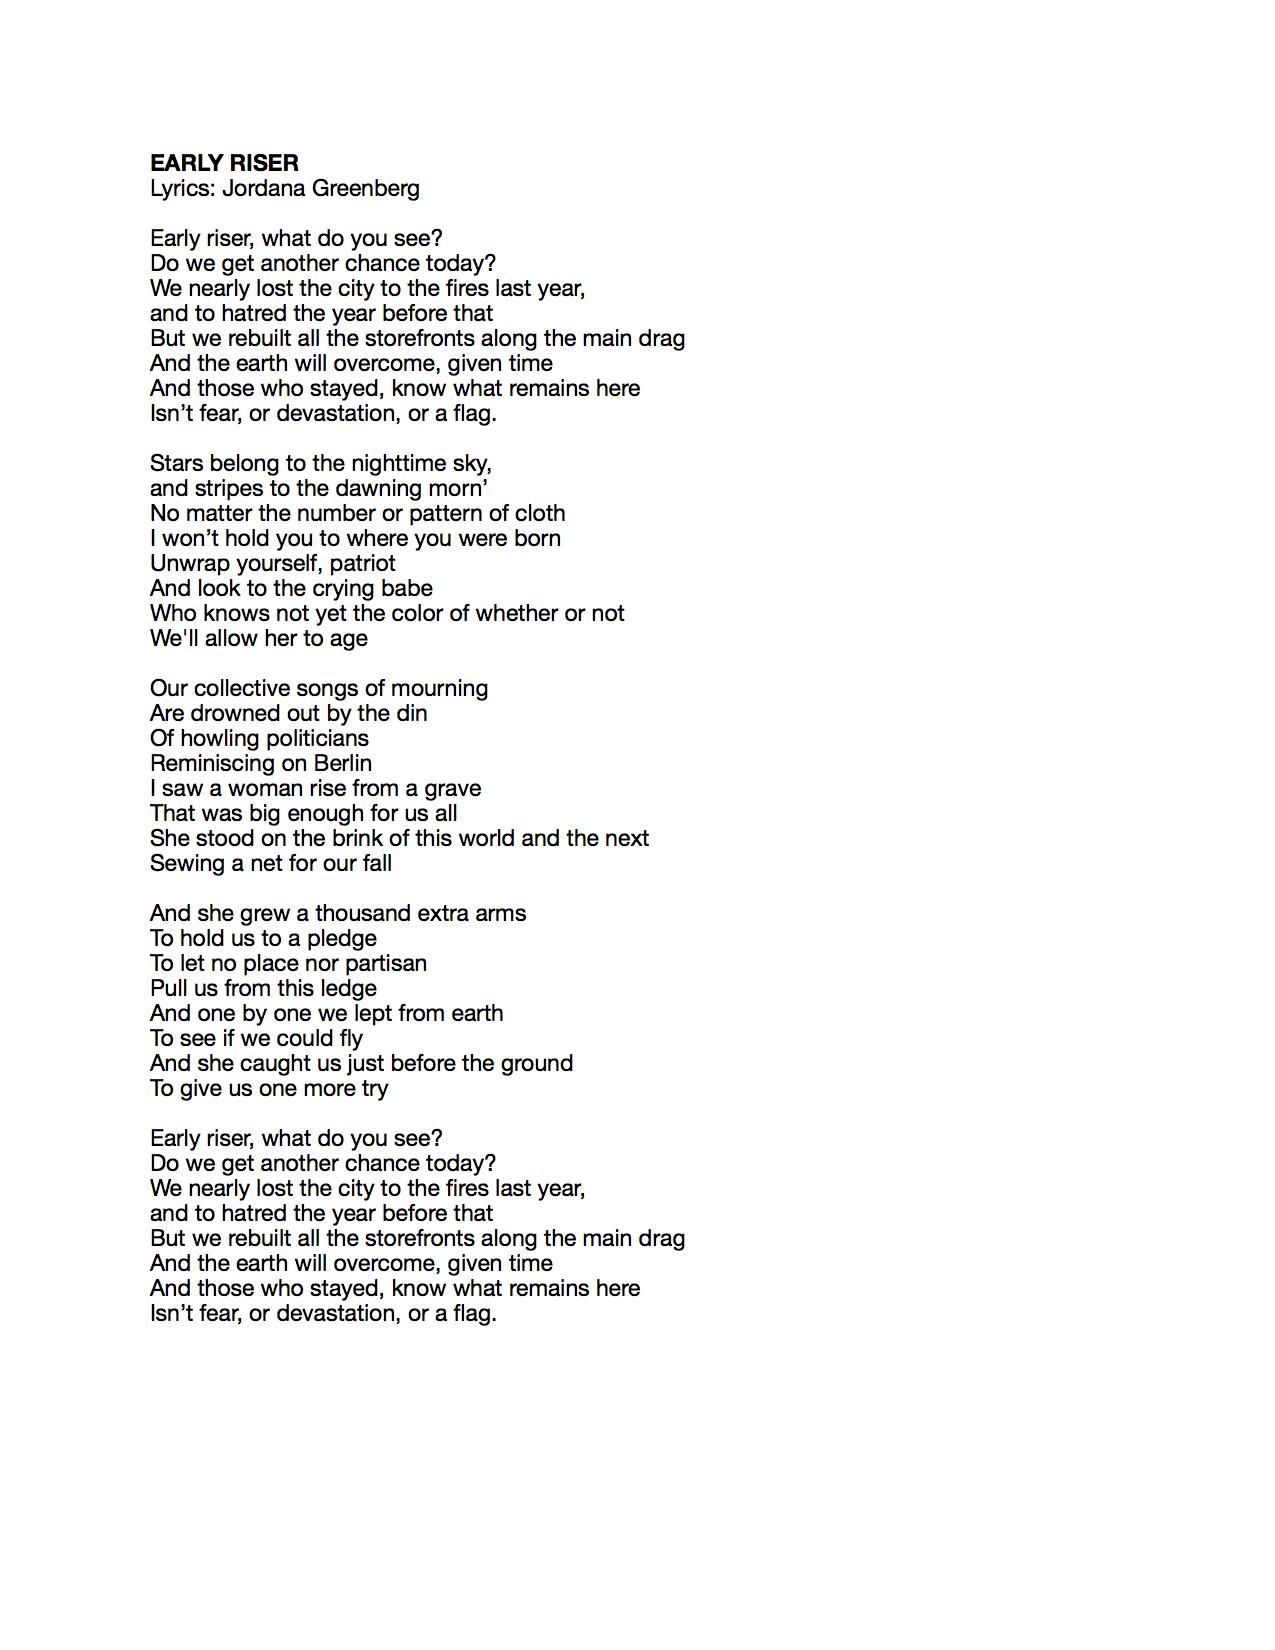 Early Riser Lyrics.jpeg